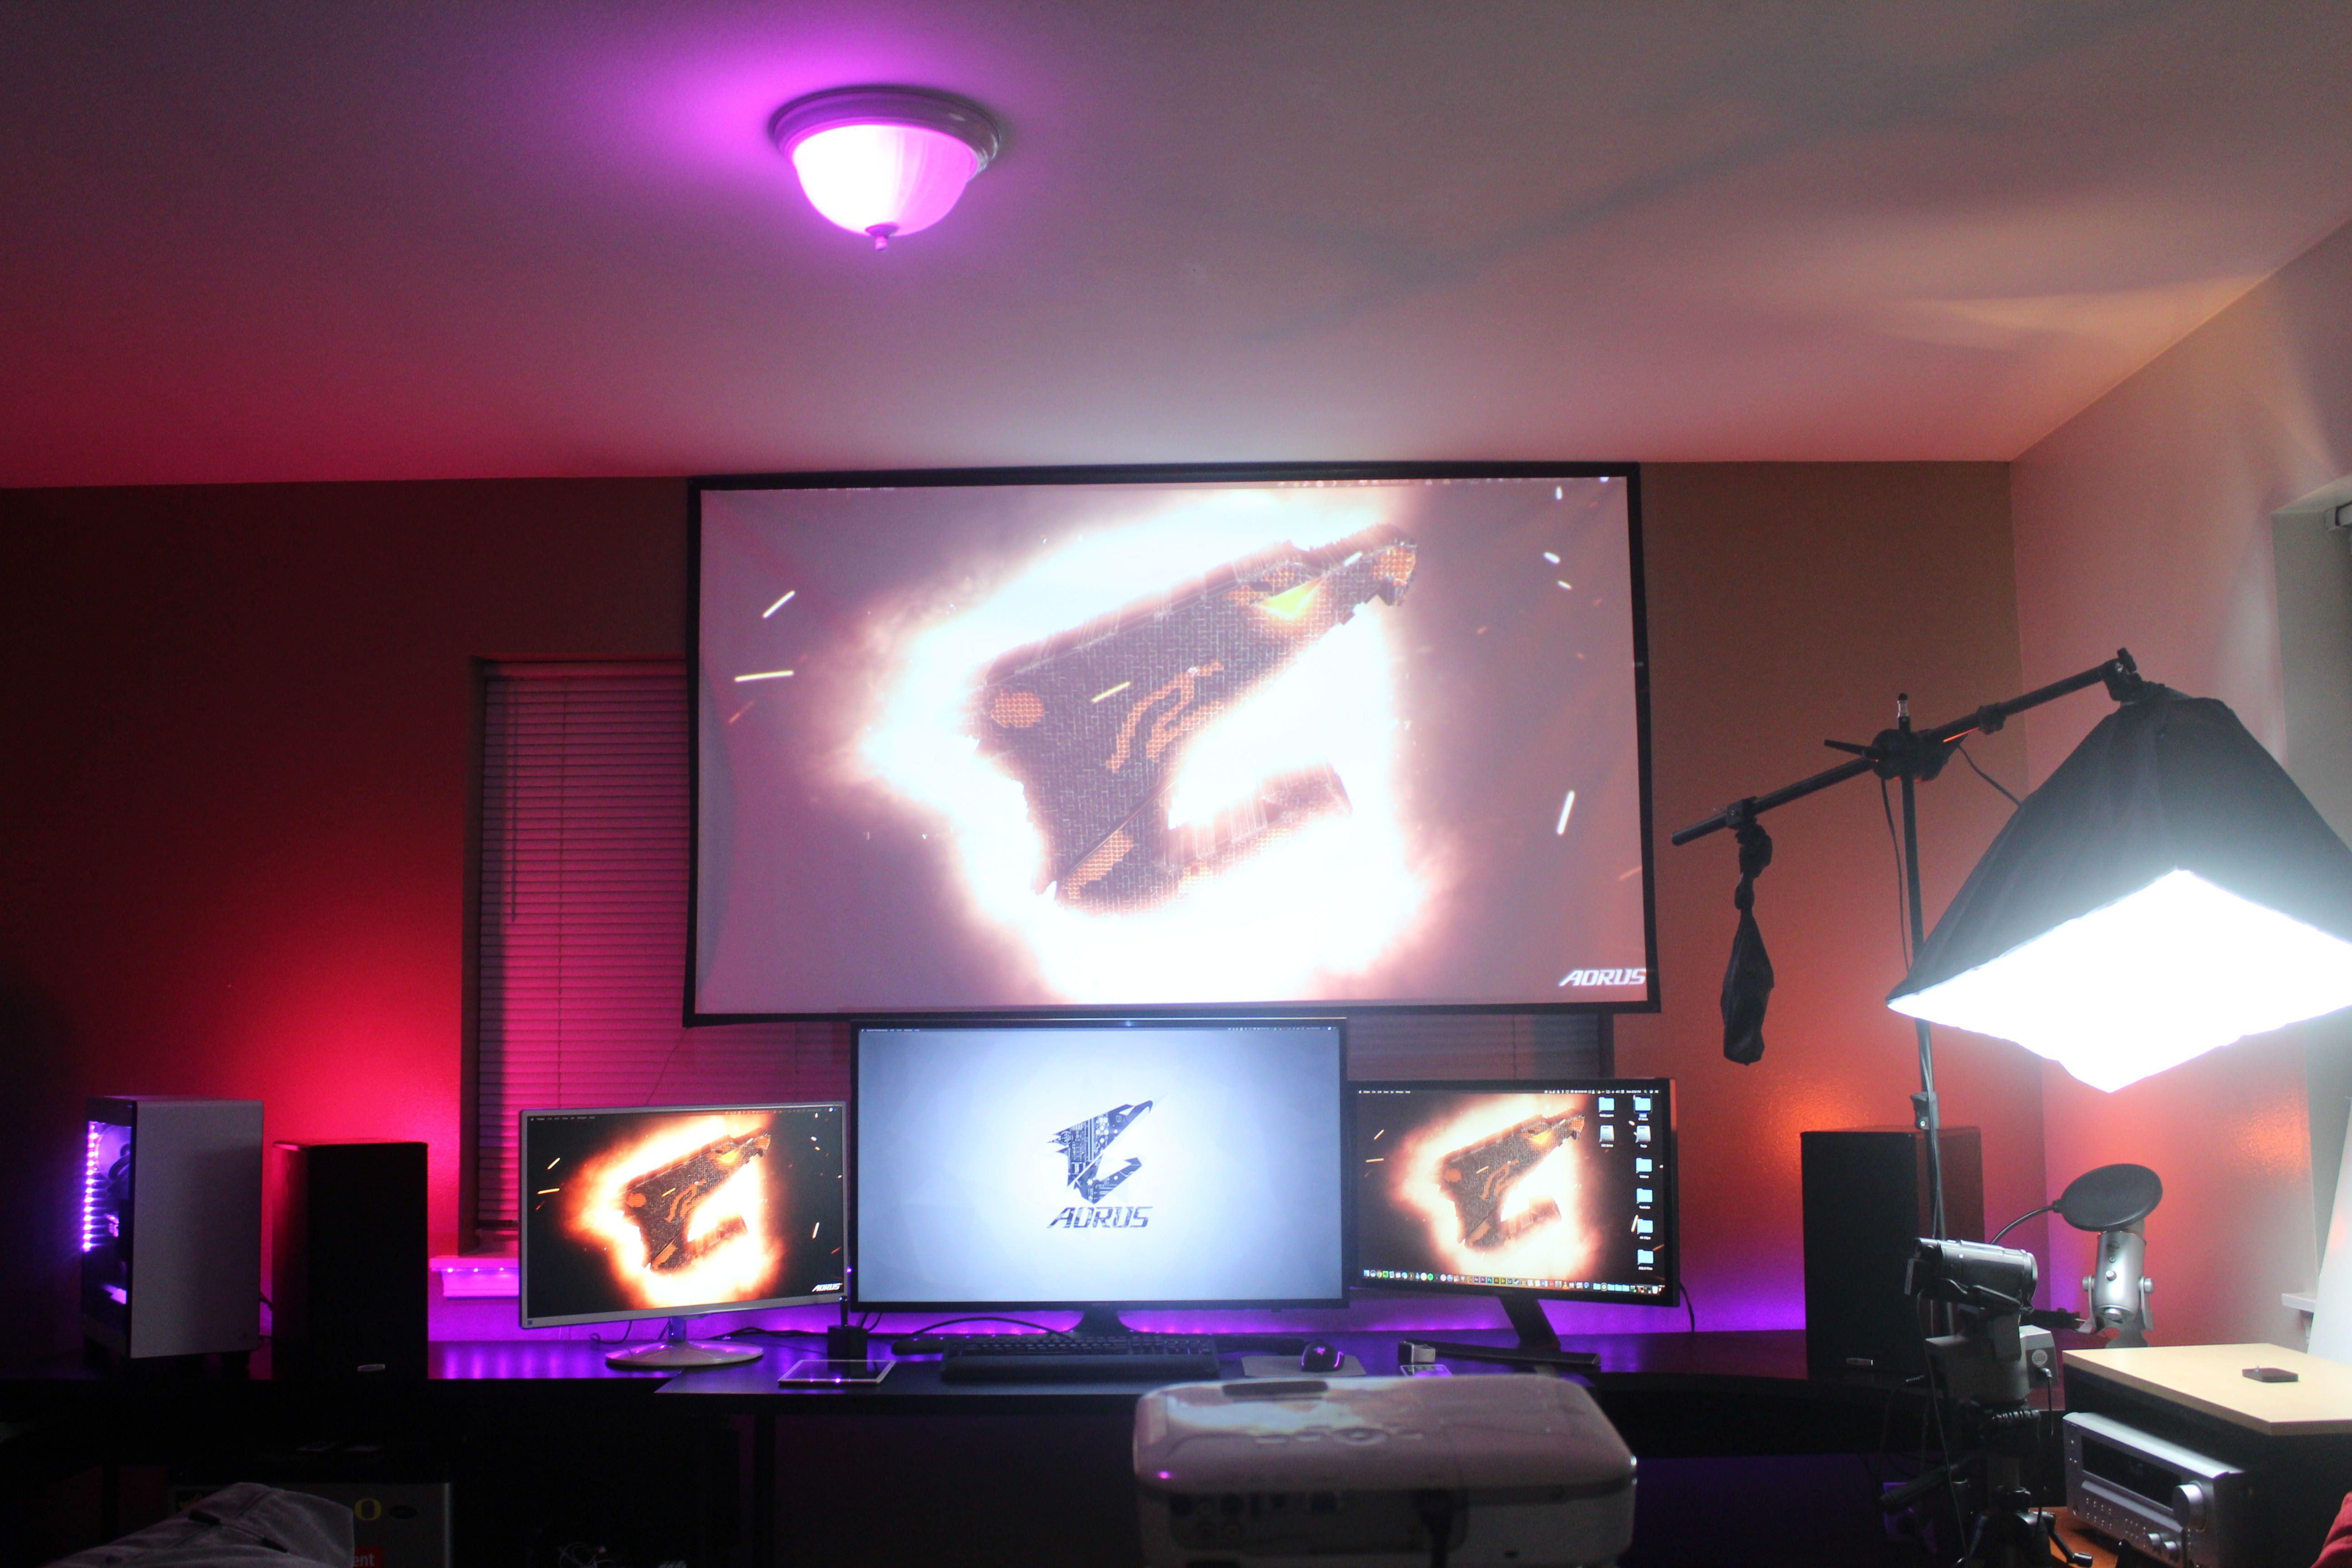 Updated My Battlestation! Computer setup, Gaming setup